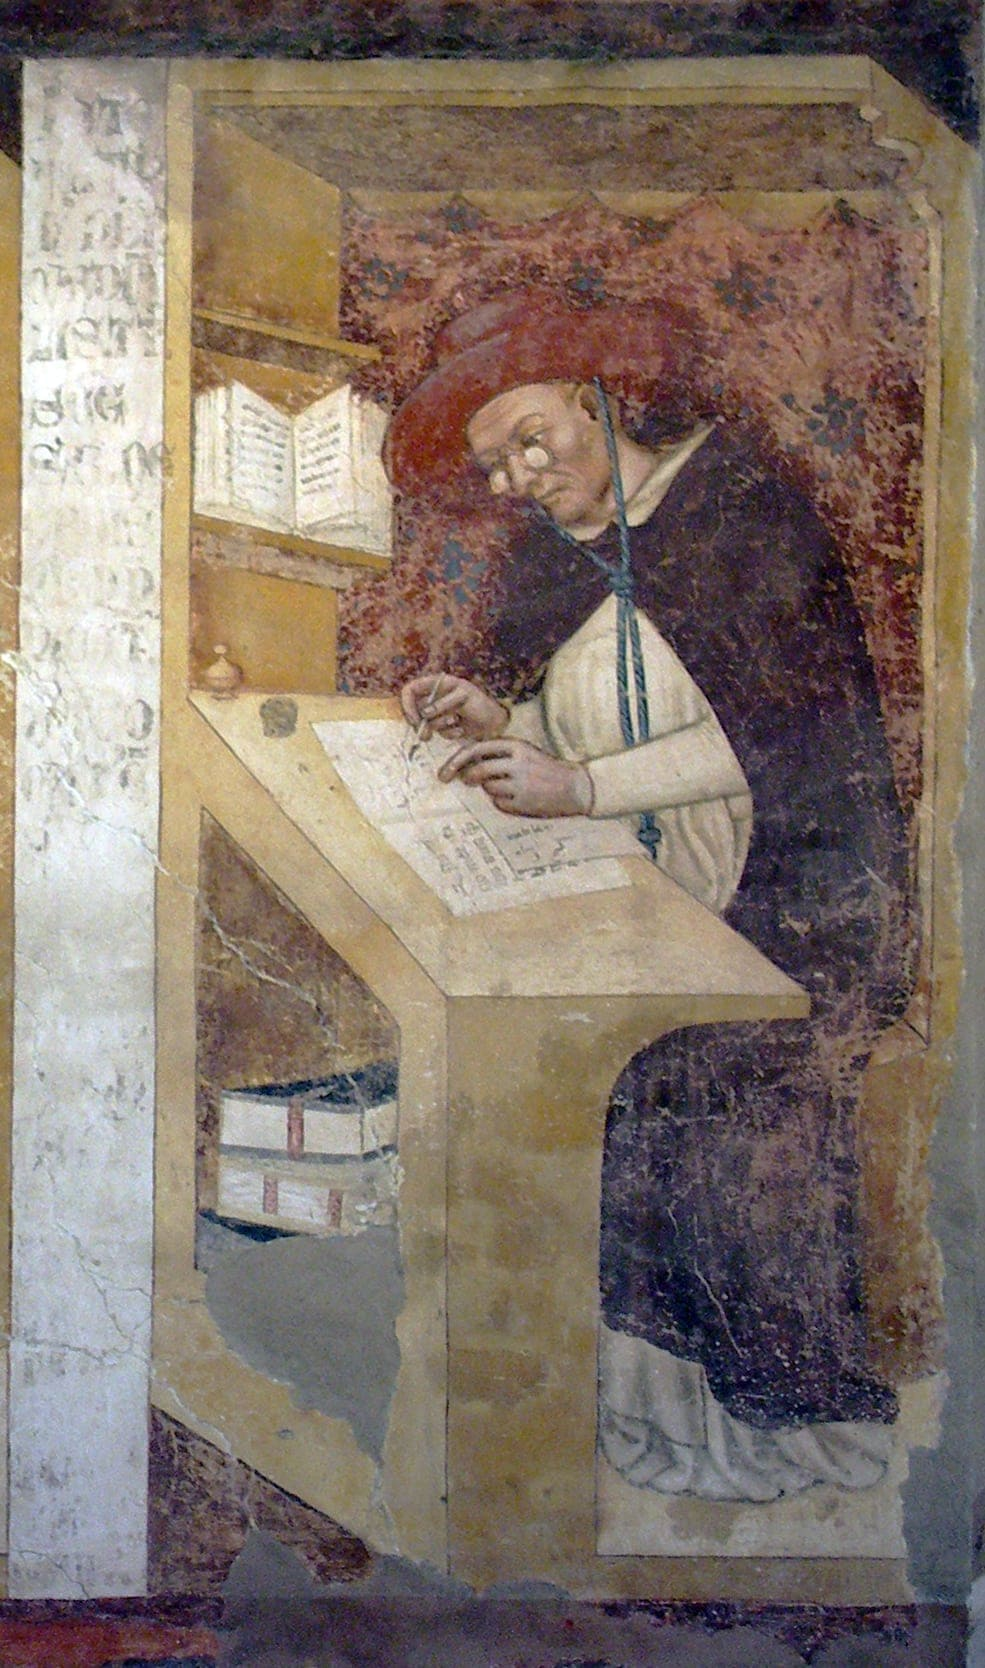 Hugo de Saint-Cher